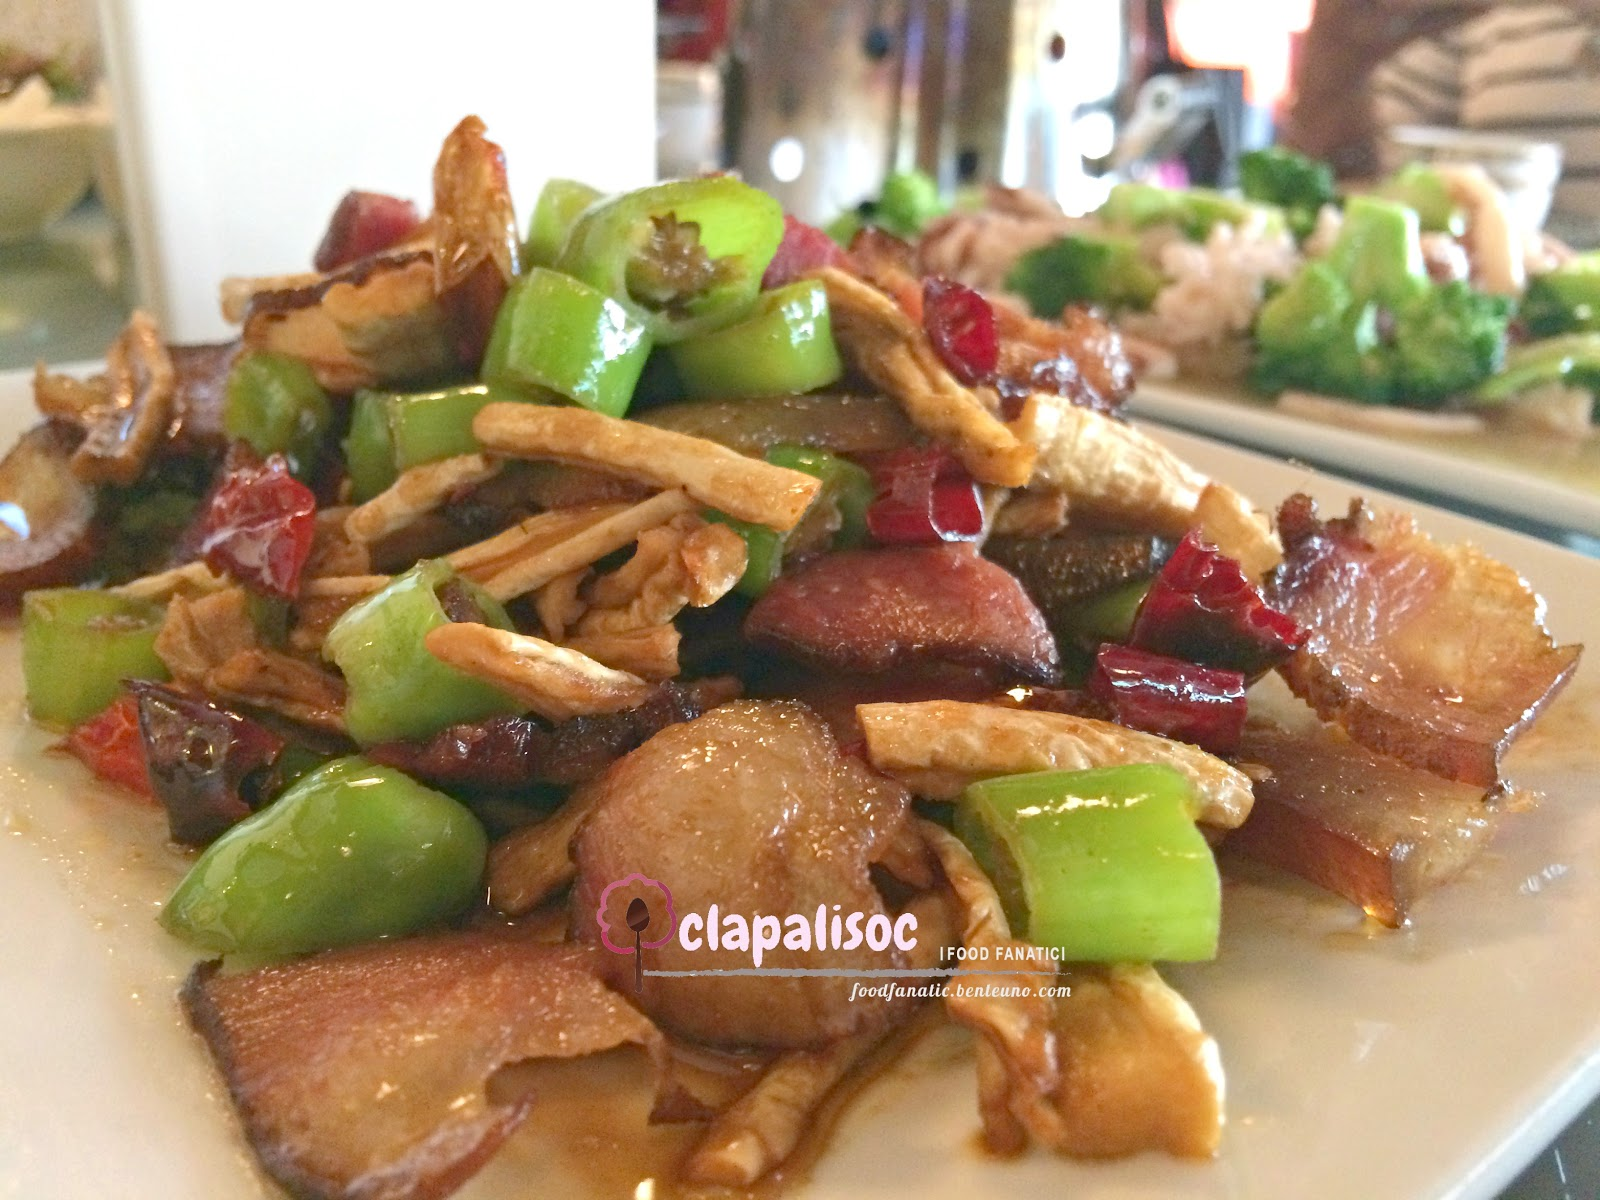 Capsa food